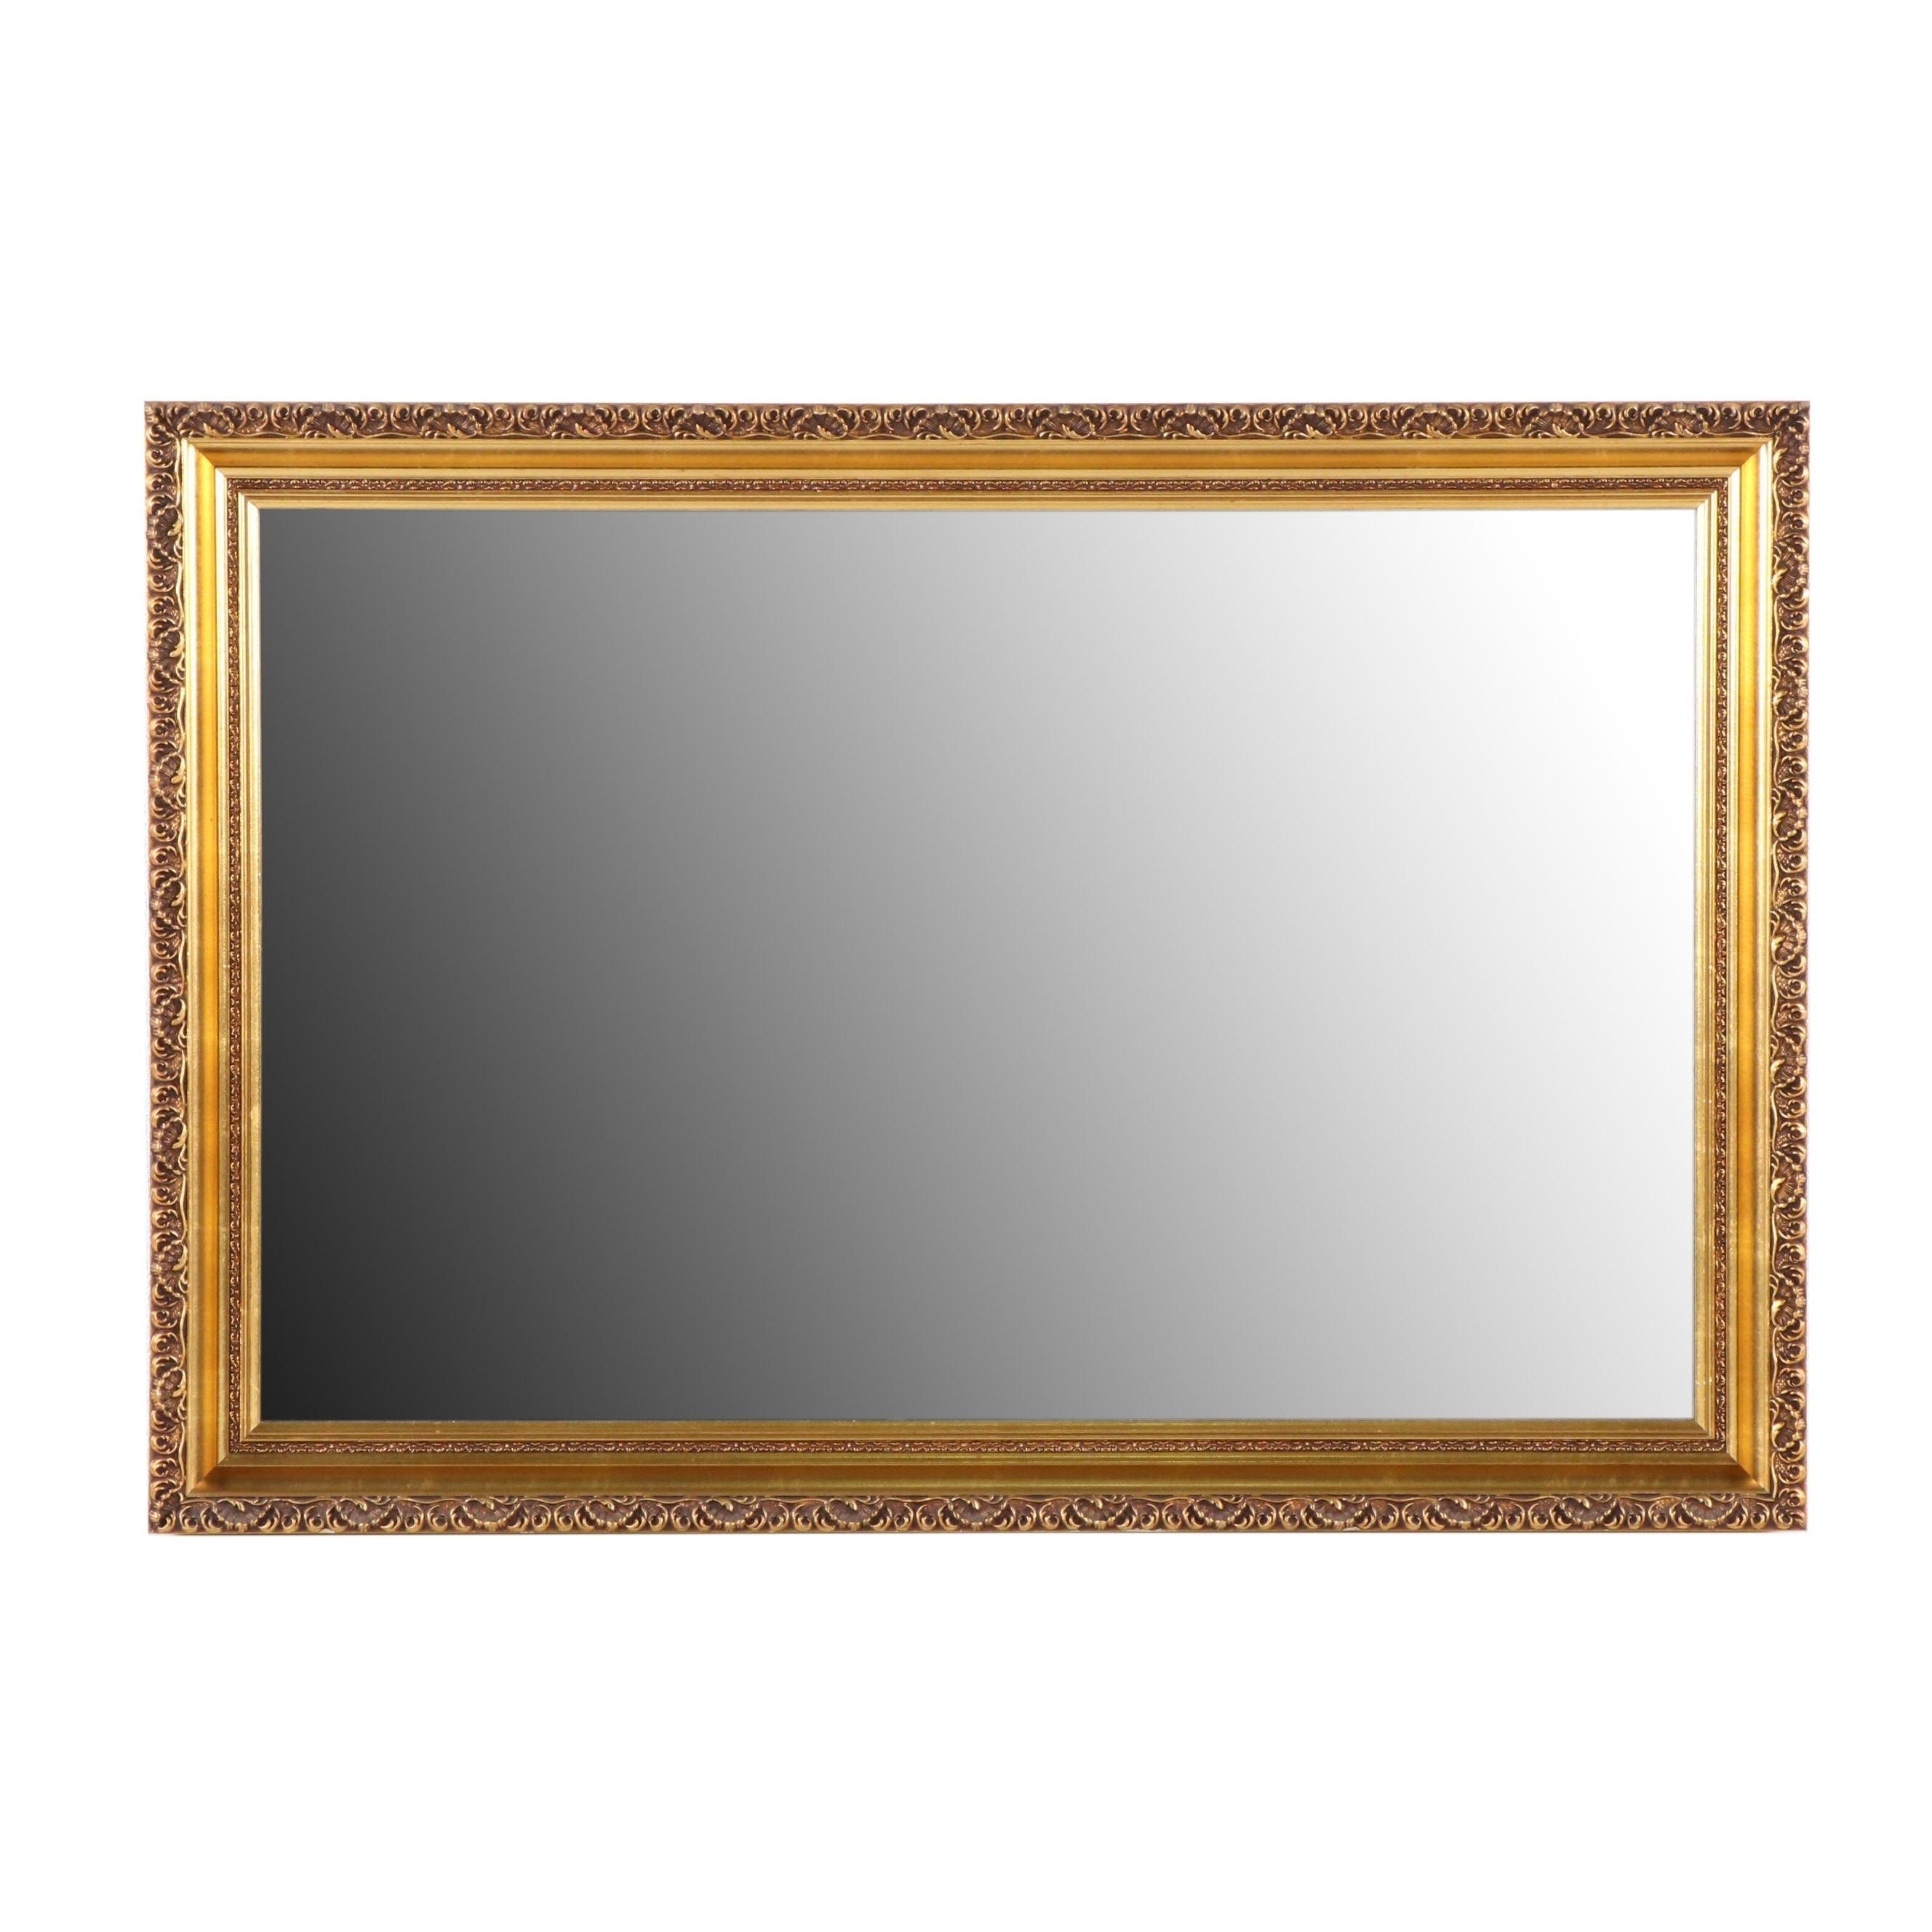 Coffey and Thompson Gilt Framed Wall Mirror, Late 20th Century